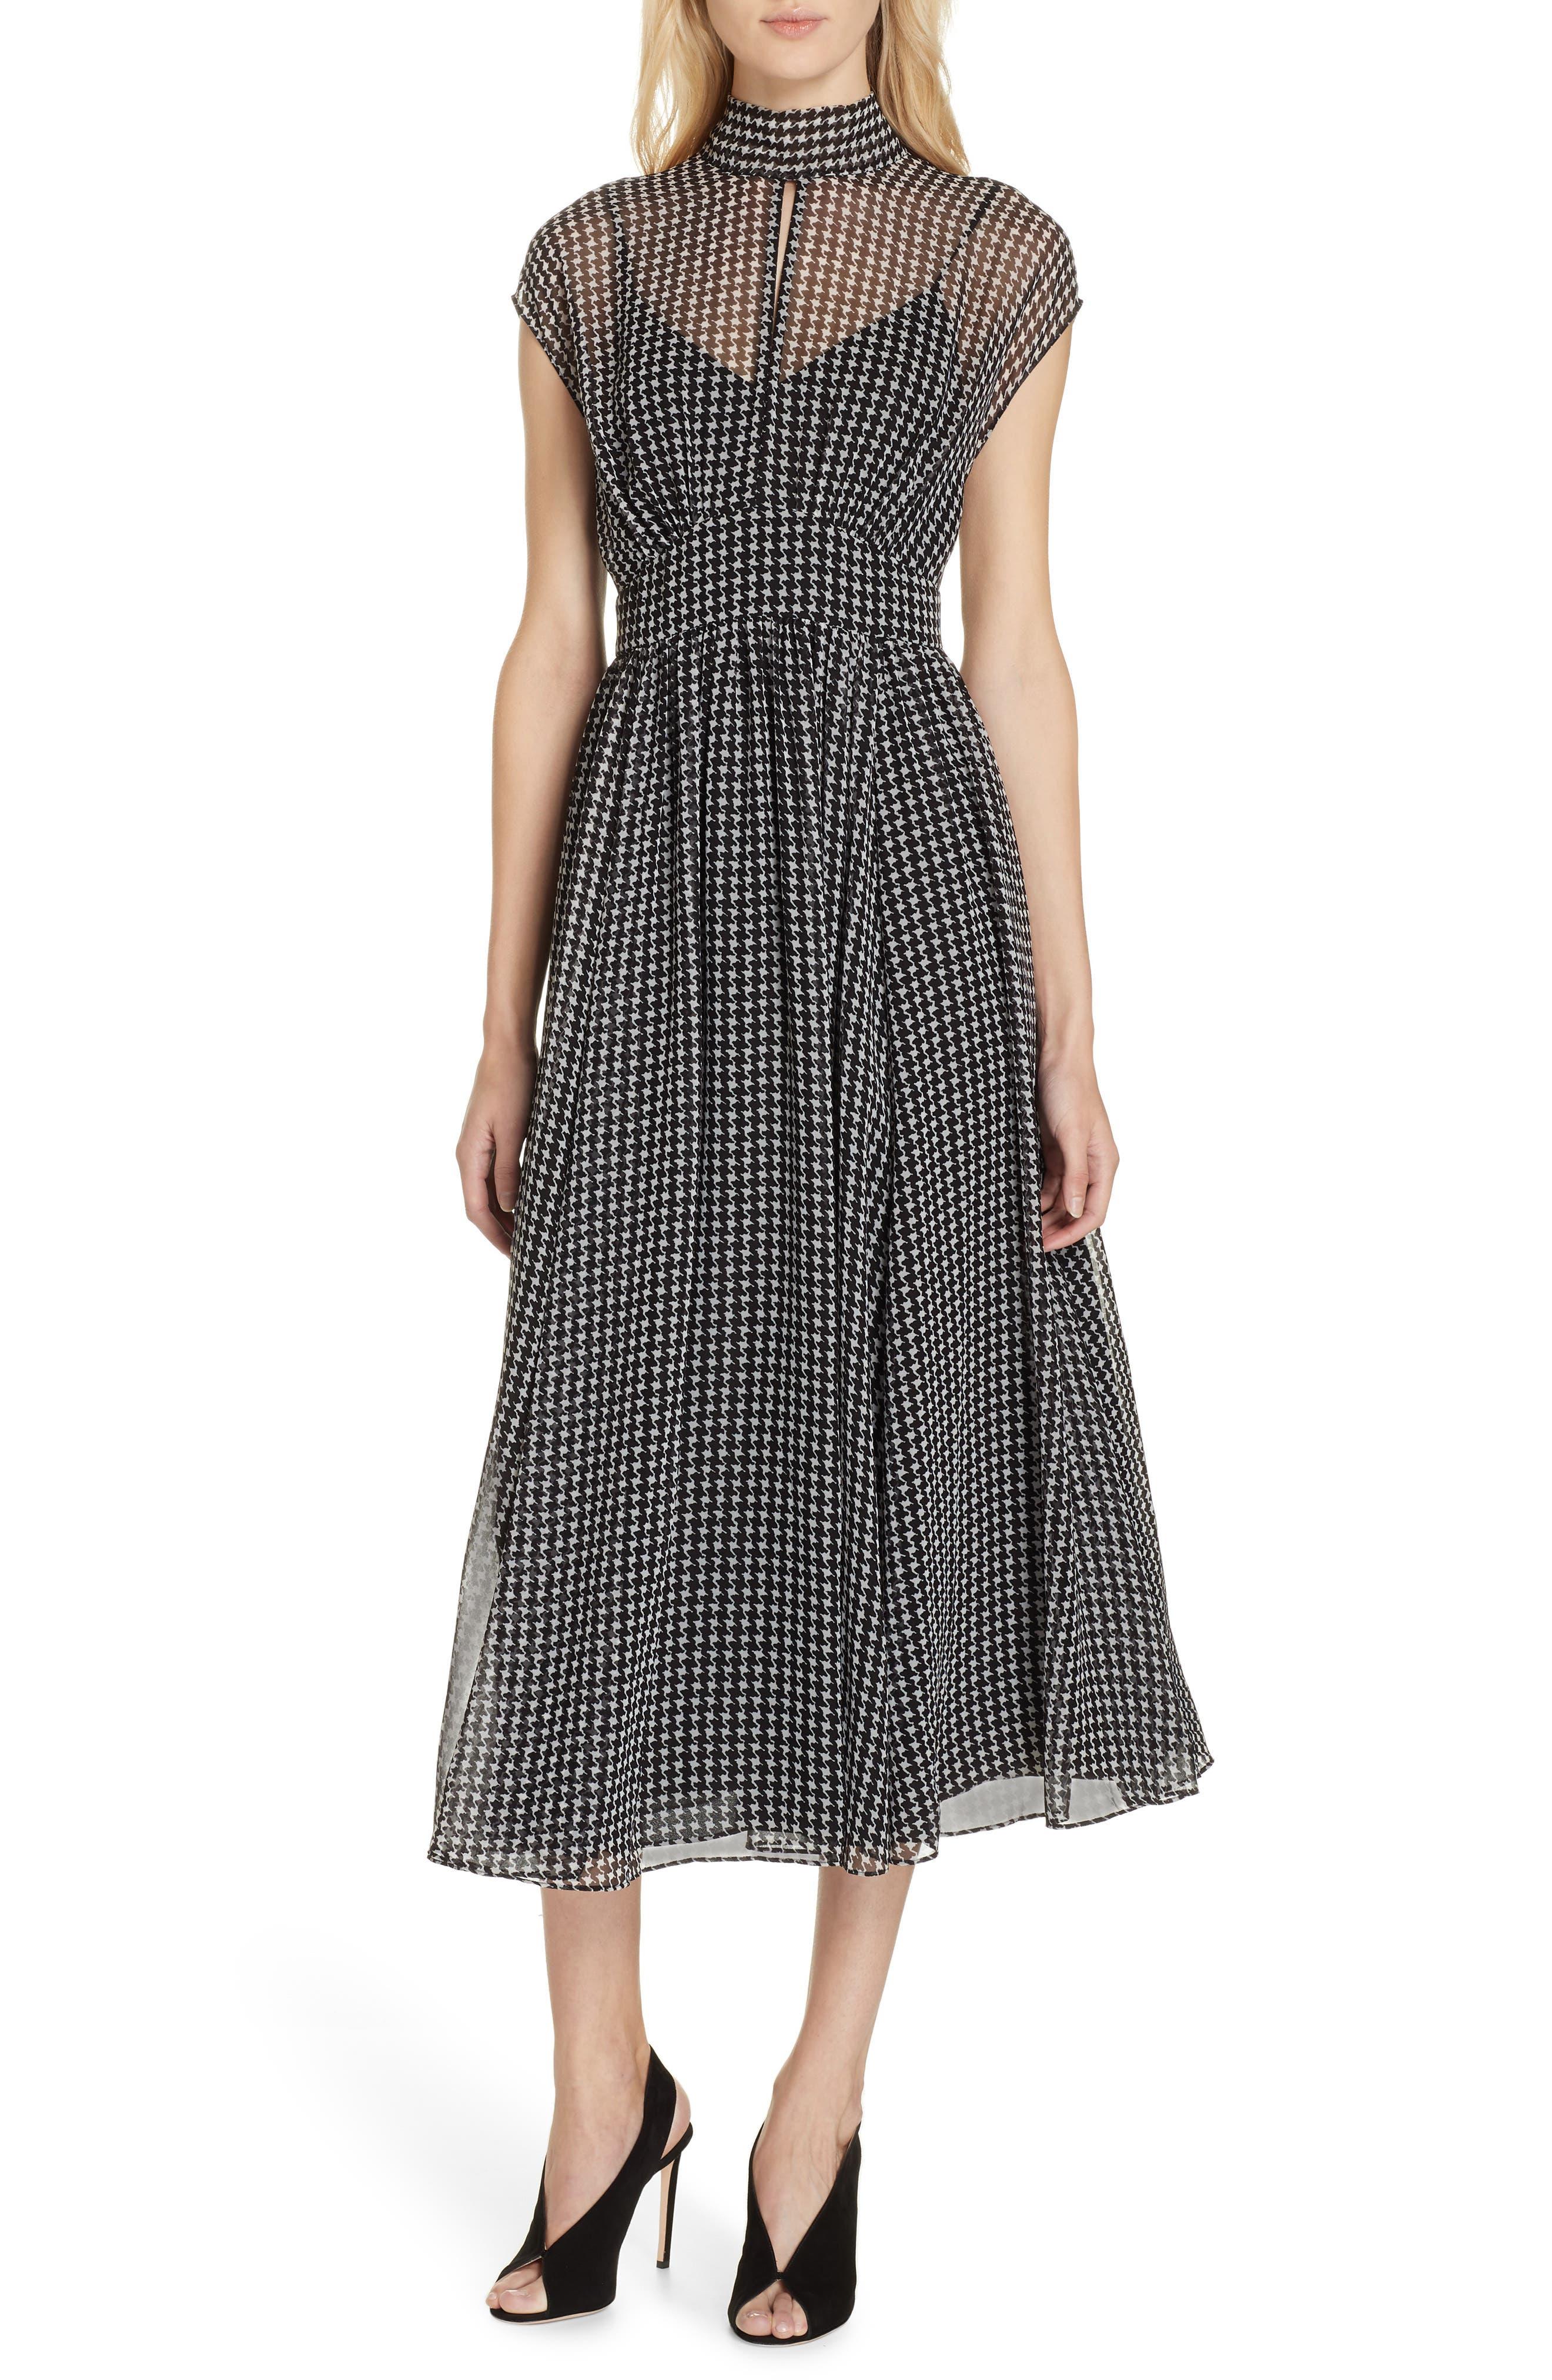 Kate Spade New York Houndstooth Chiffon Midi Dress